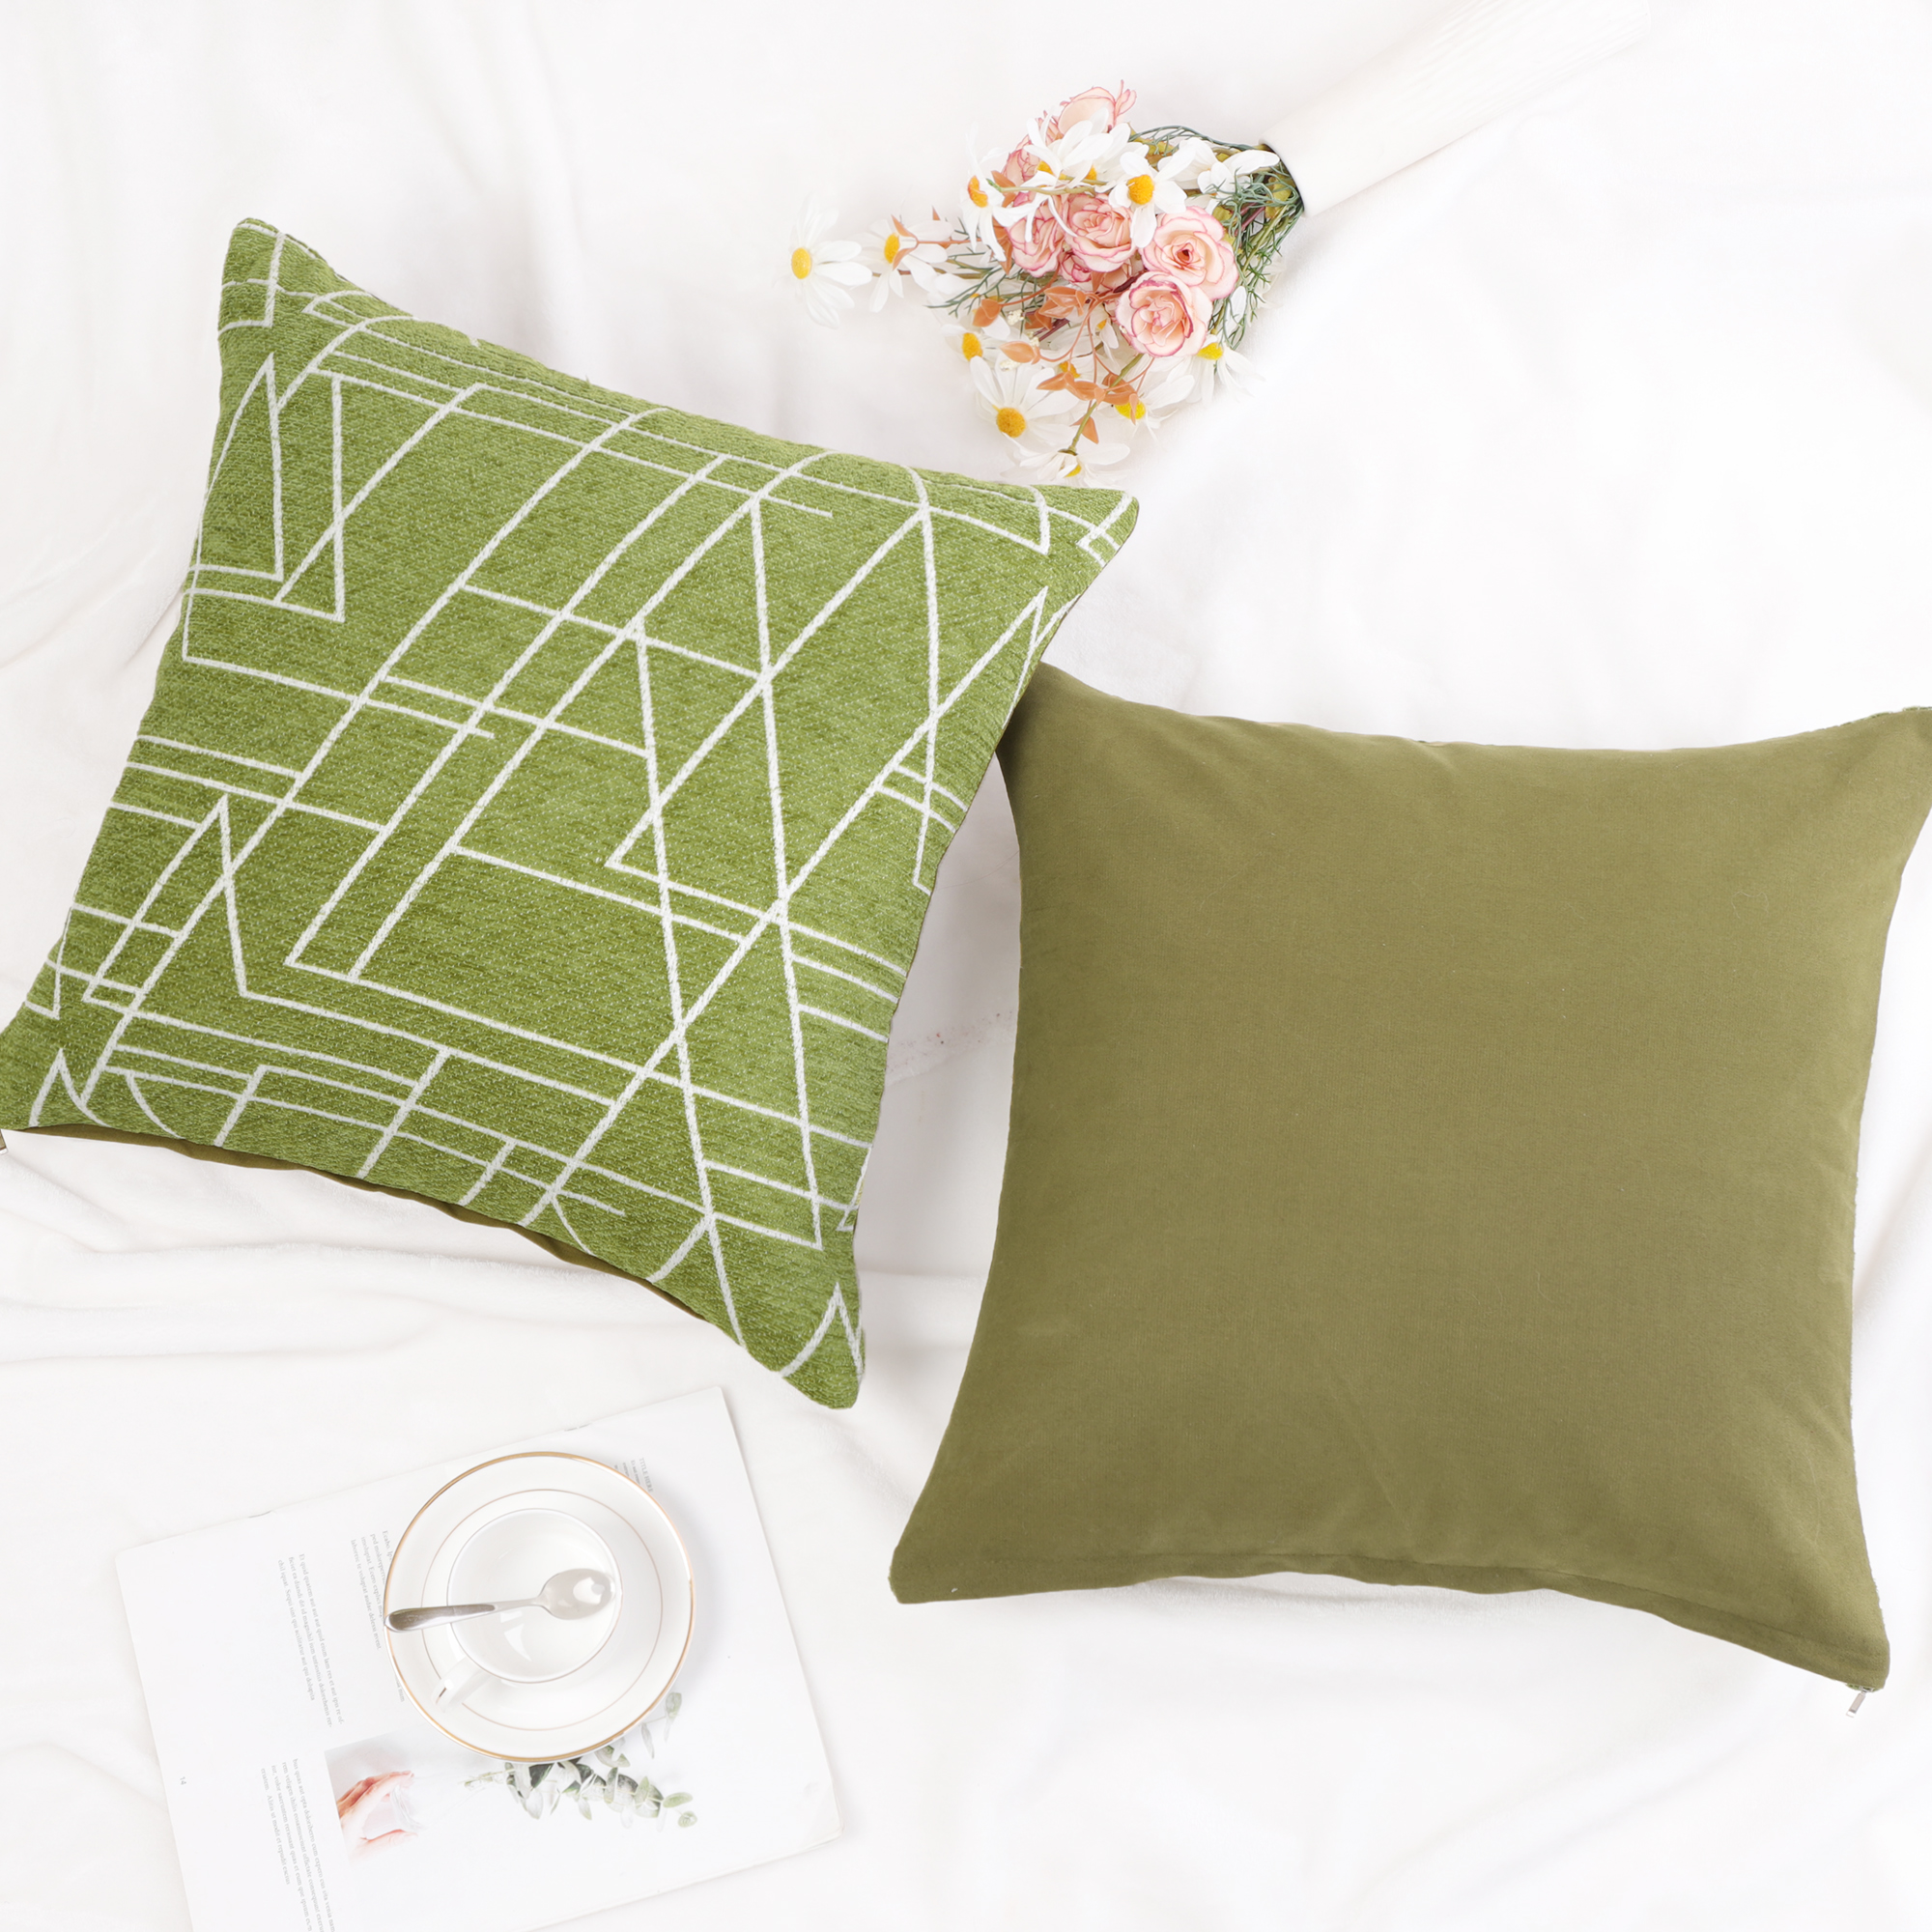 Decoration-Pillow-Covers-Cotton-Linen-Throw-Pillow-Case-Cushion-Cover thumbnail 53